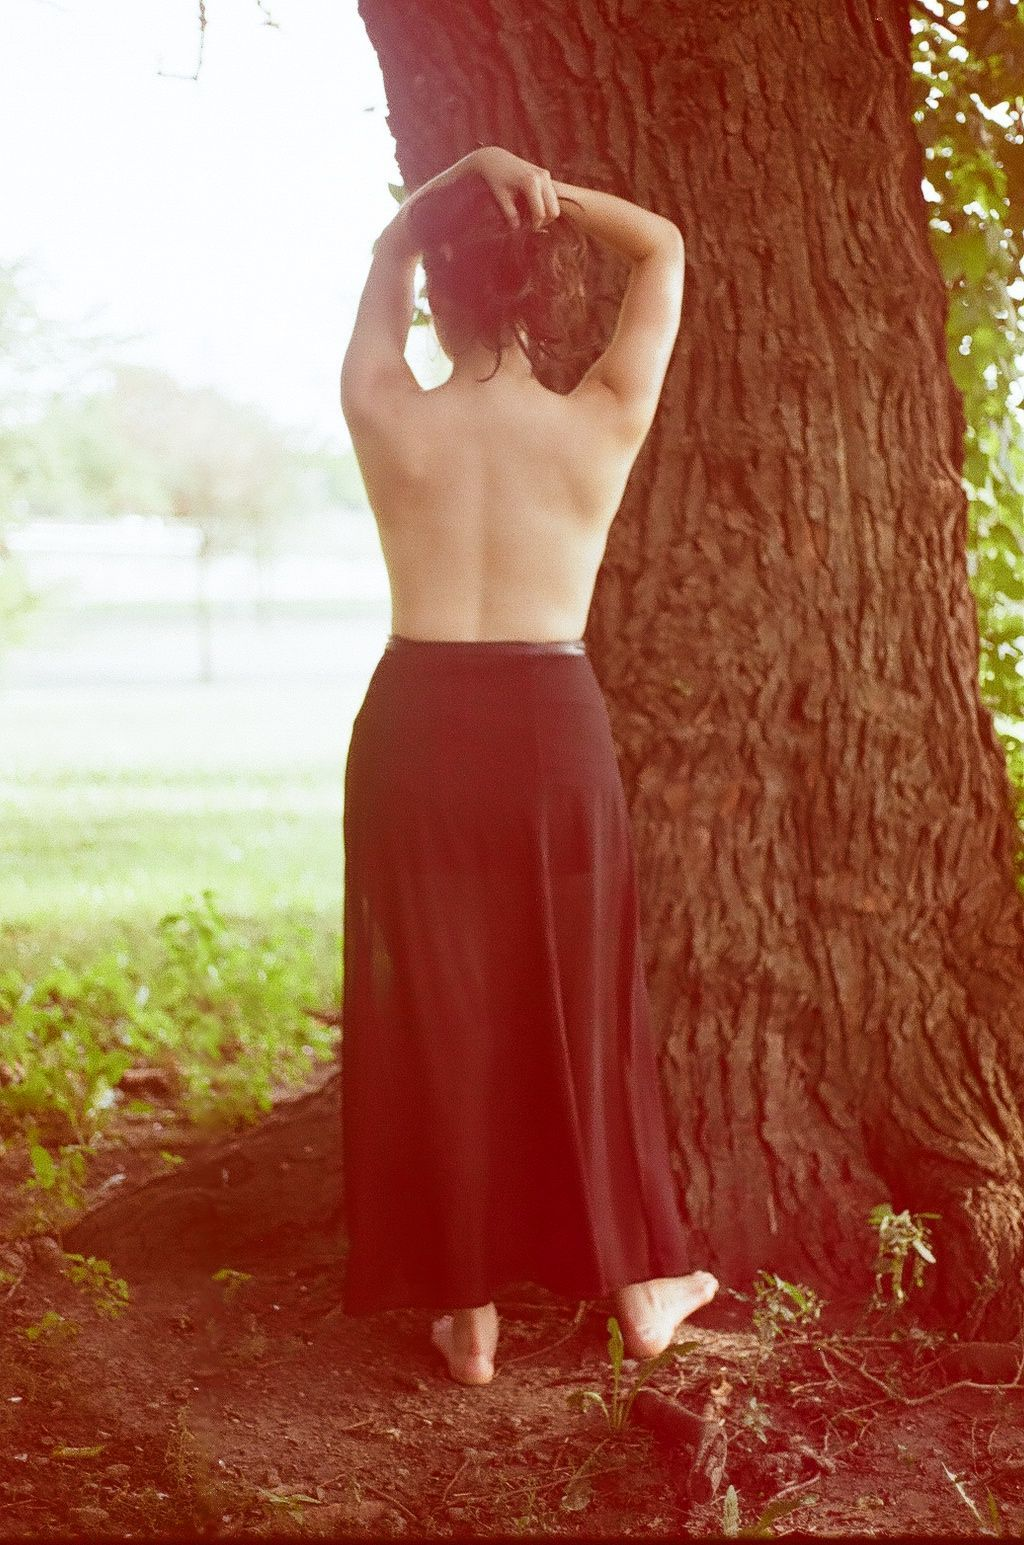 Sideboobs Lorena Rae  nude (55 pics), Facebook, in bikini